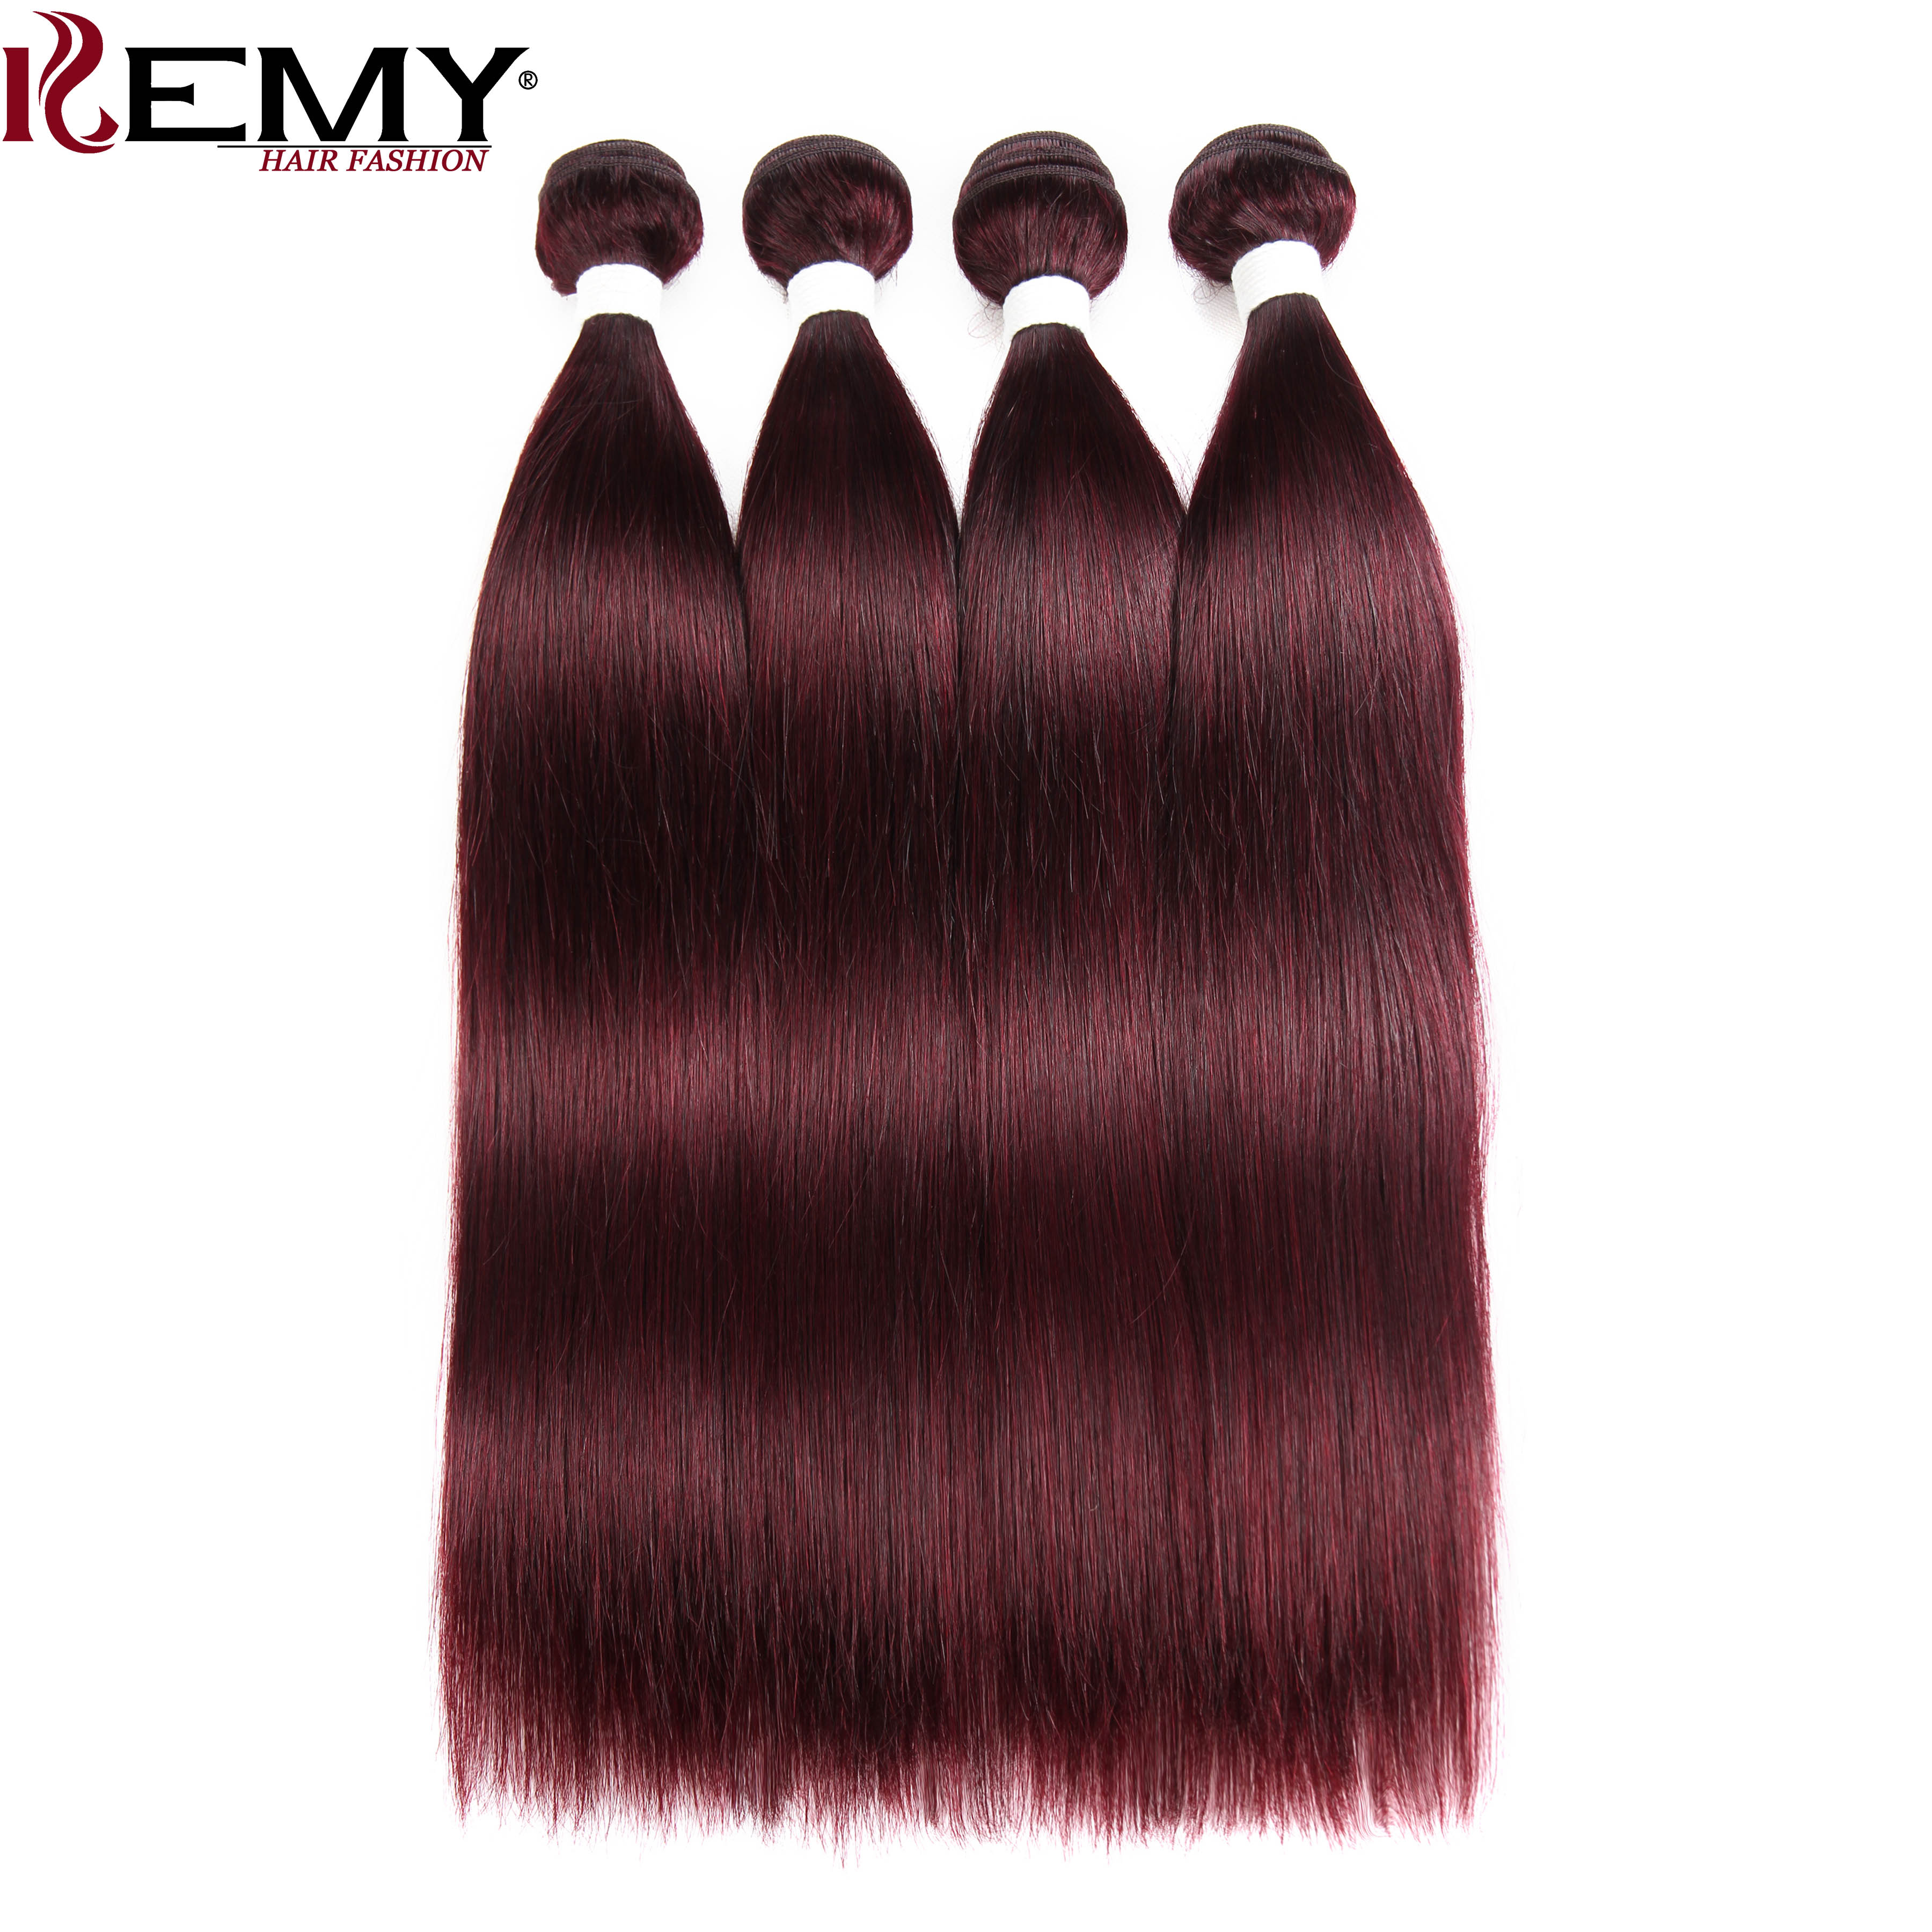 99J/Burgundy Red Color Human Hair Bundles Deal KEMY HAIR Brazilian Straight Human Hair Weaves 100% Remy Human Hair Extension